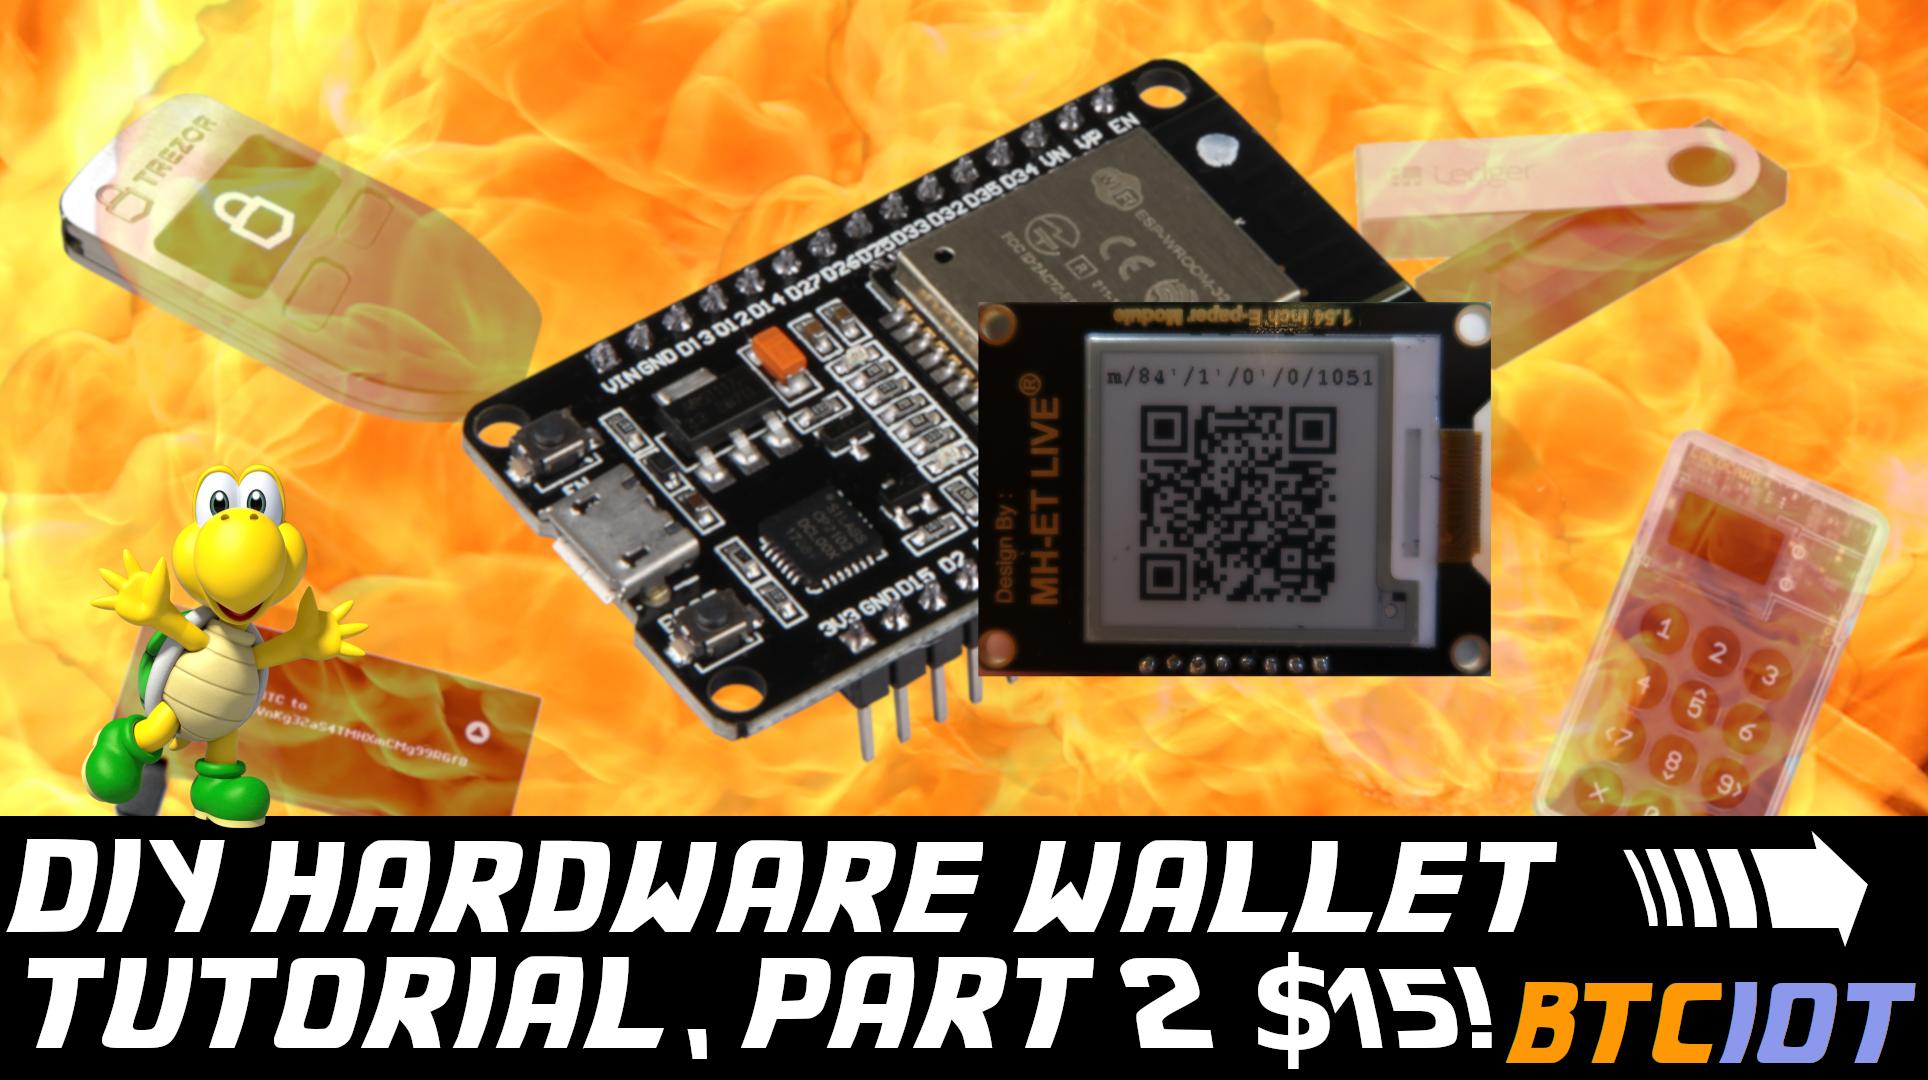 ESP32 hardware wallet